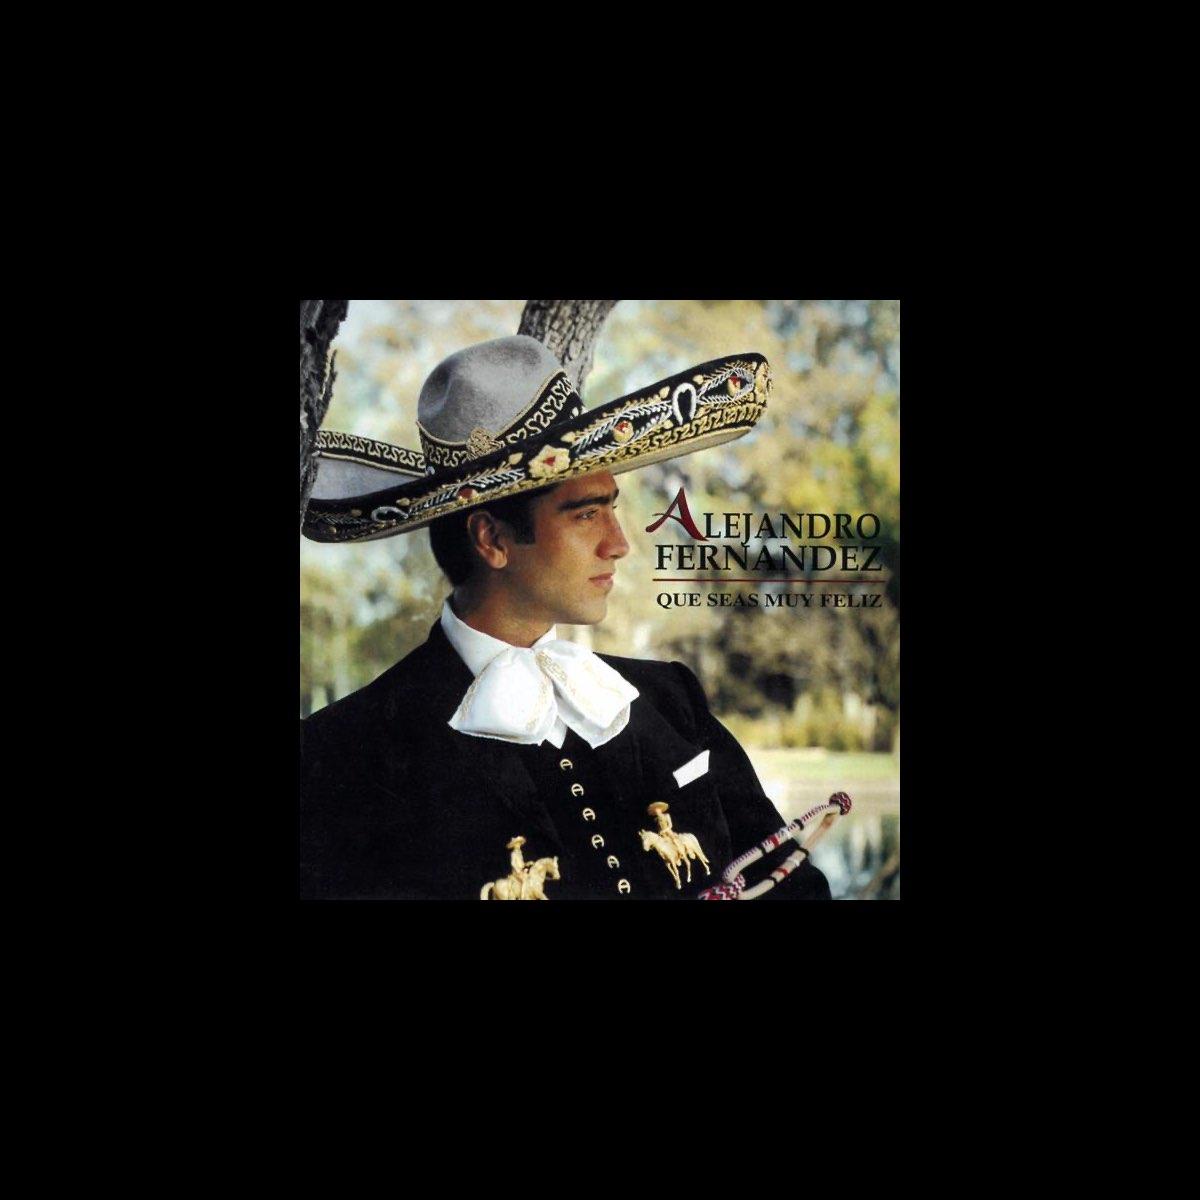 Que Seas Muy Feliz By Alejandro Fernández On Apple Music